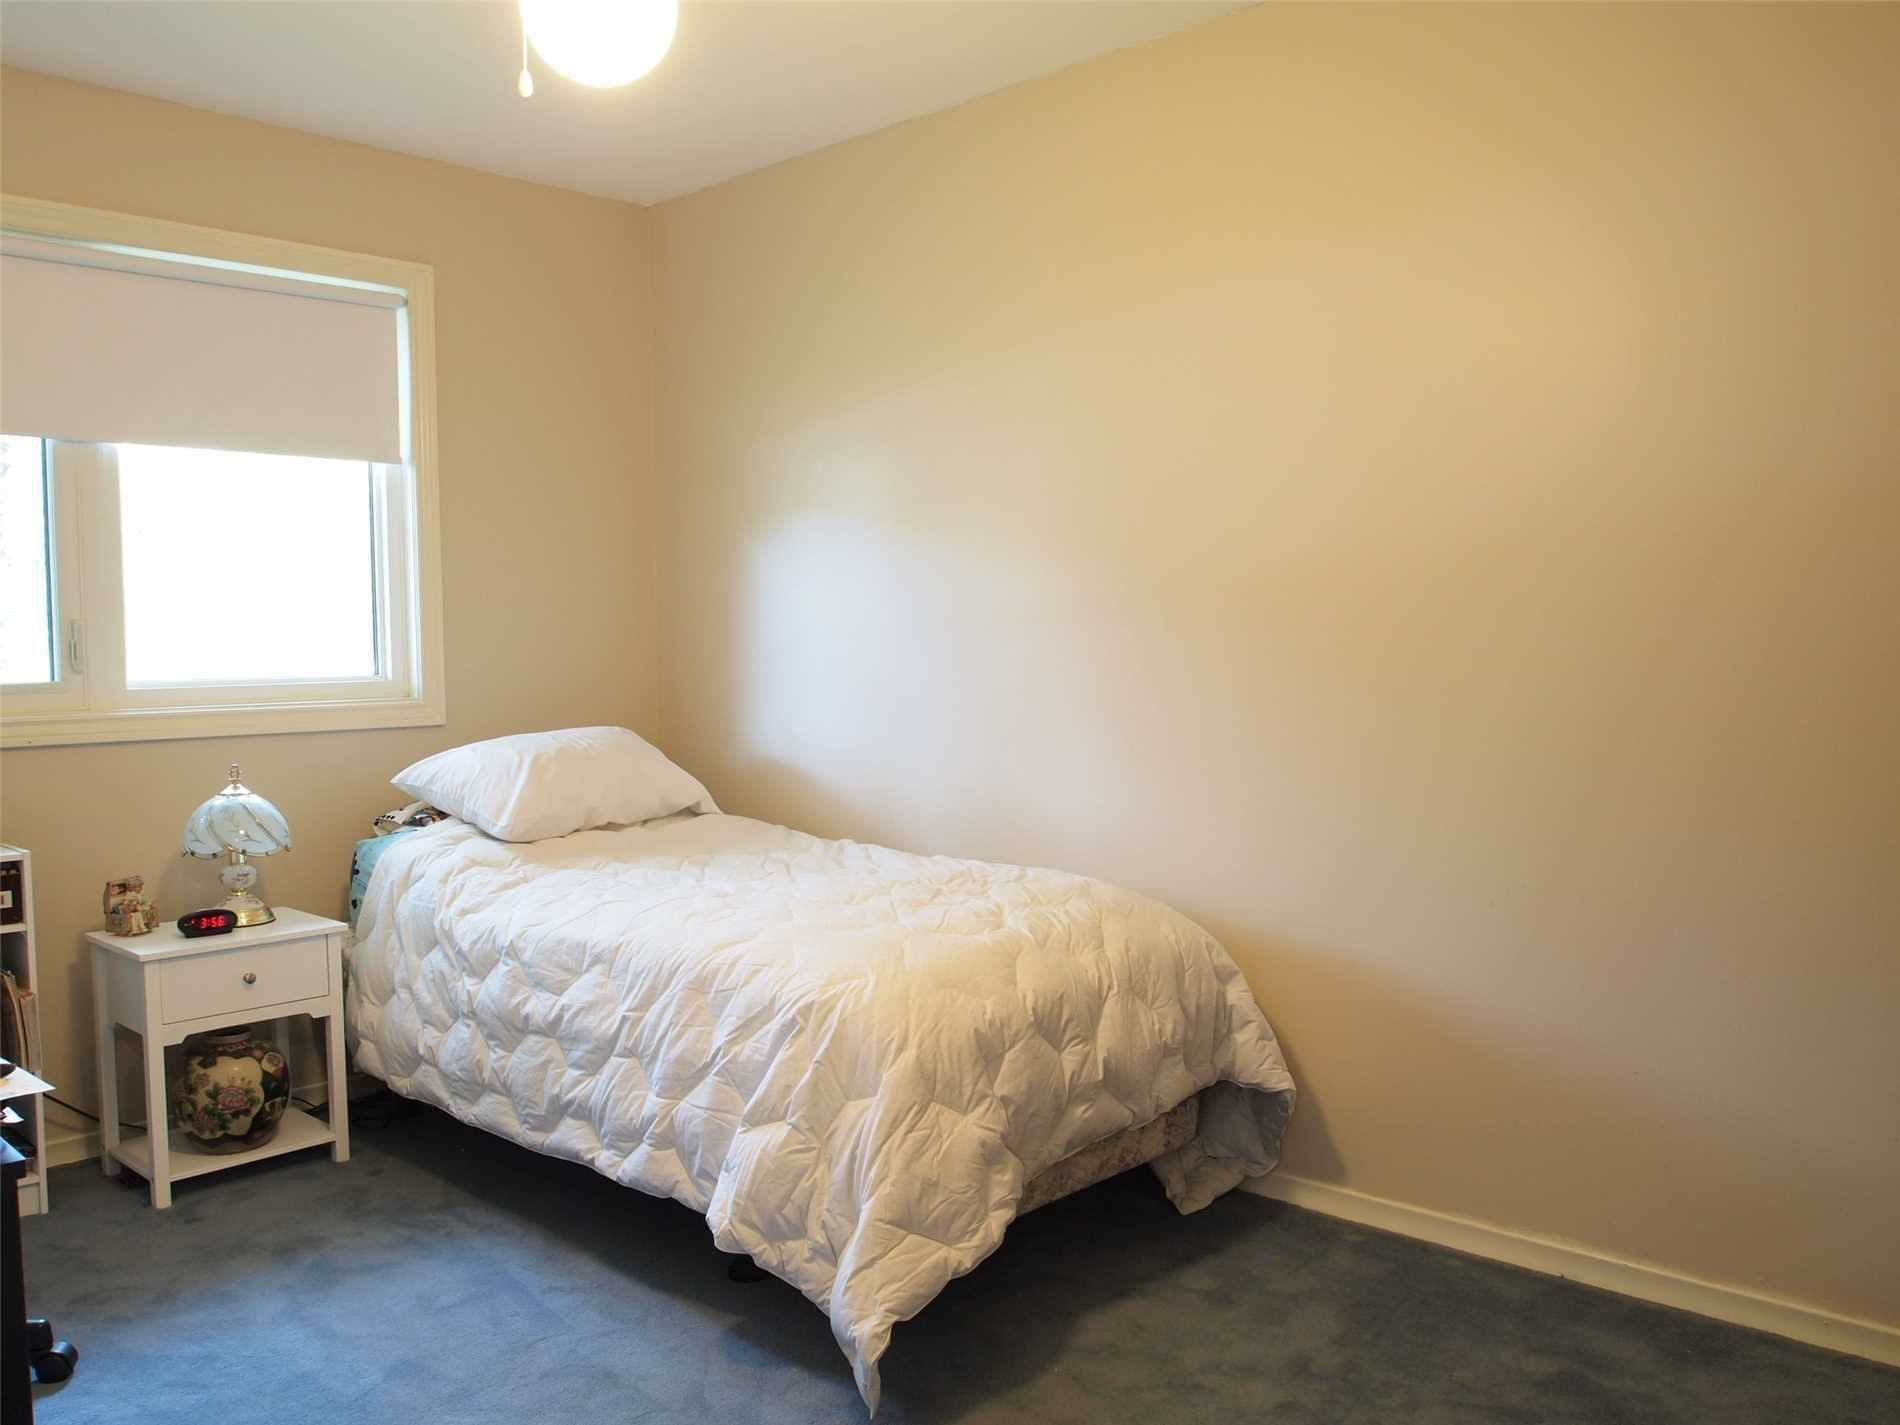 Photo 12: Photos: 105 Fifth Street in Brock: Beaverton House (Bungalow) for sale : MLS®# N4564596